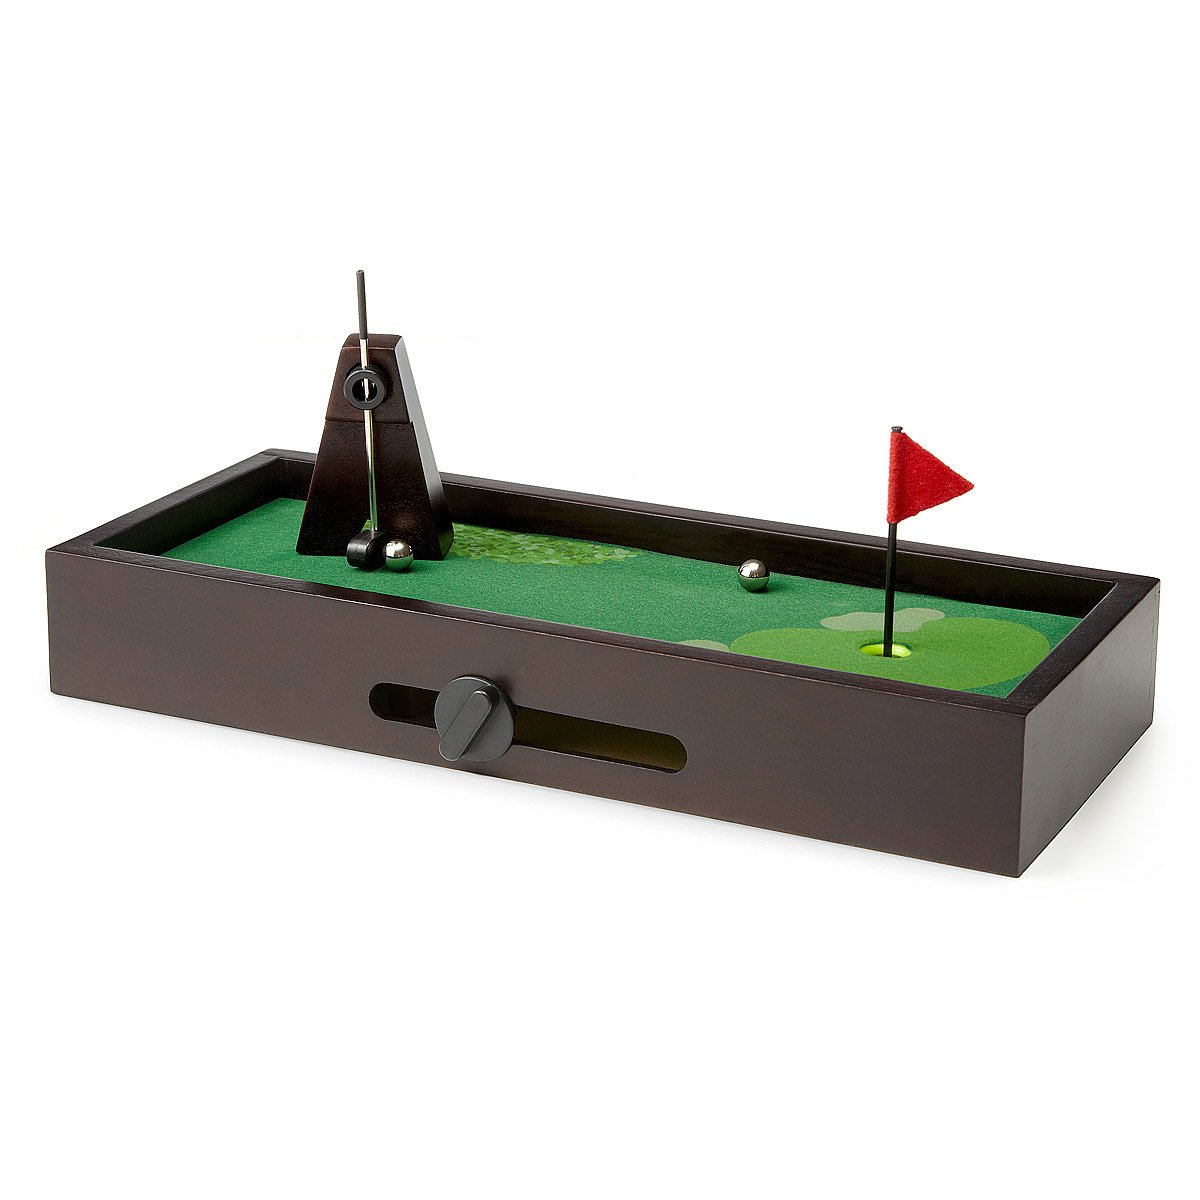 desktop golf | golf desk game for office | uncommongoods